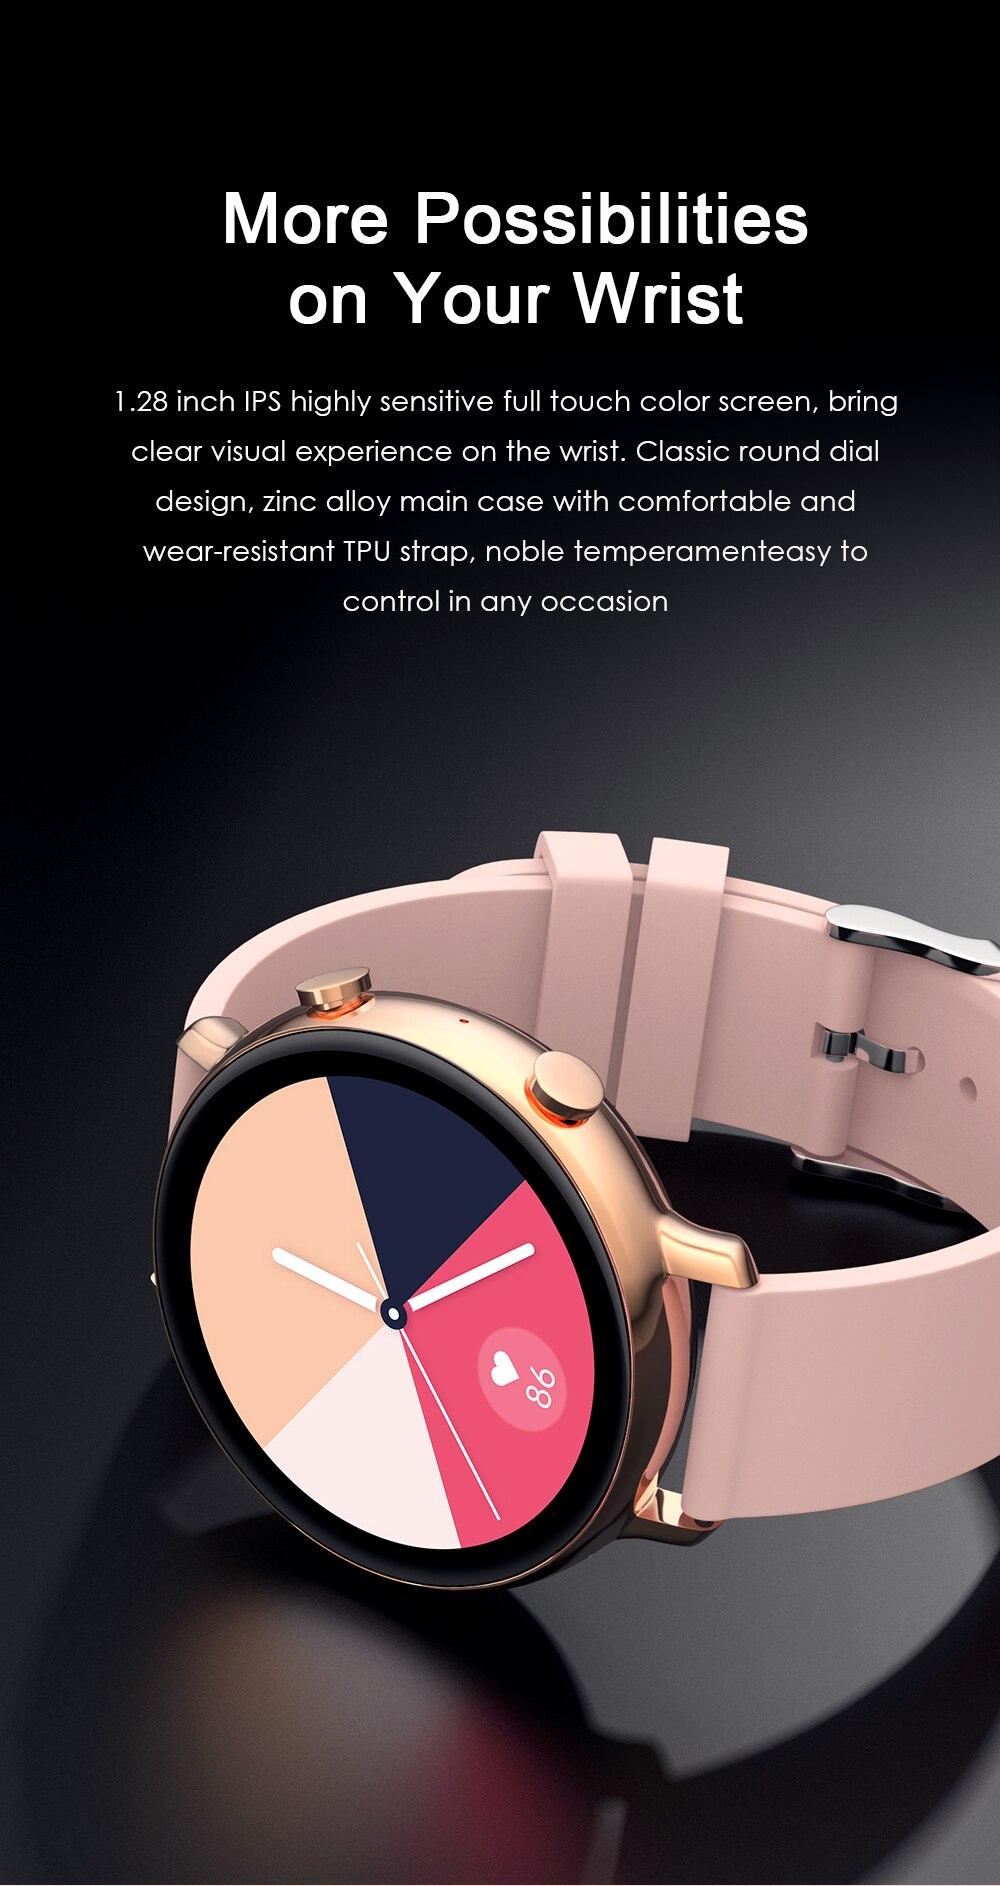 Ha252f04bb8774e4498124a943bdf2cf8z SANLEPUS 2021 Smart Watch Dial Calls Men Women Waterproof Smartwatch ECG PPG Fitness Bracelet Band For Android Apple Xiaomi